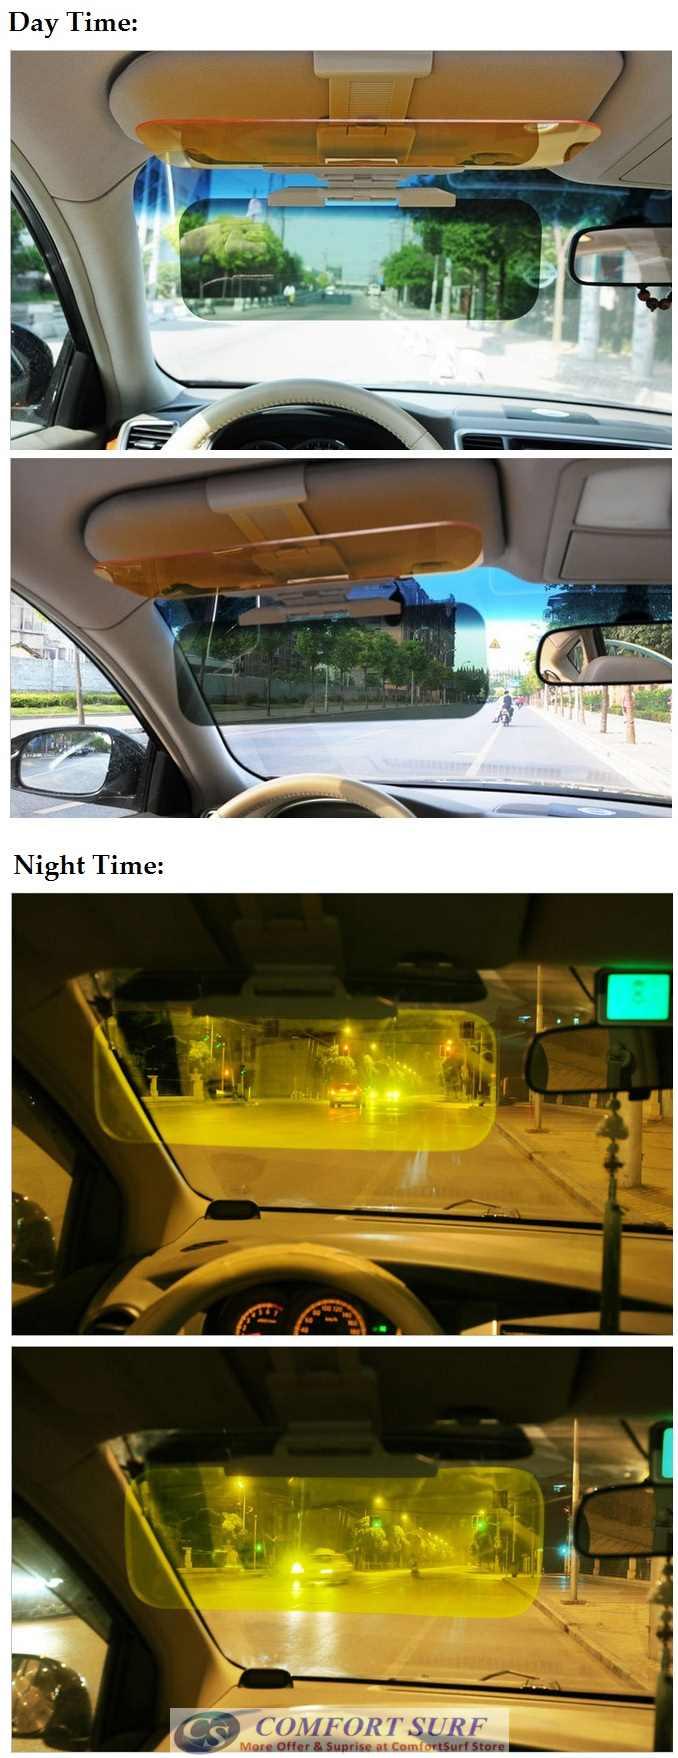 Clip On Anti Dazzle Car Sun Blocker Visor for Day & Night